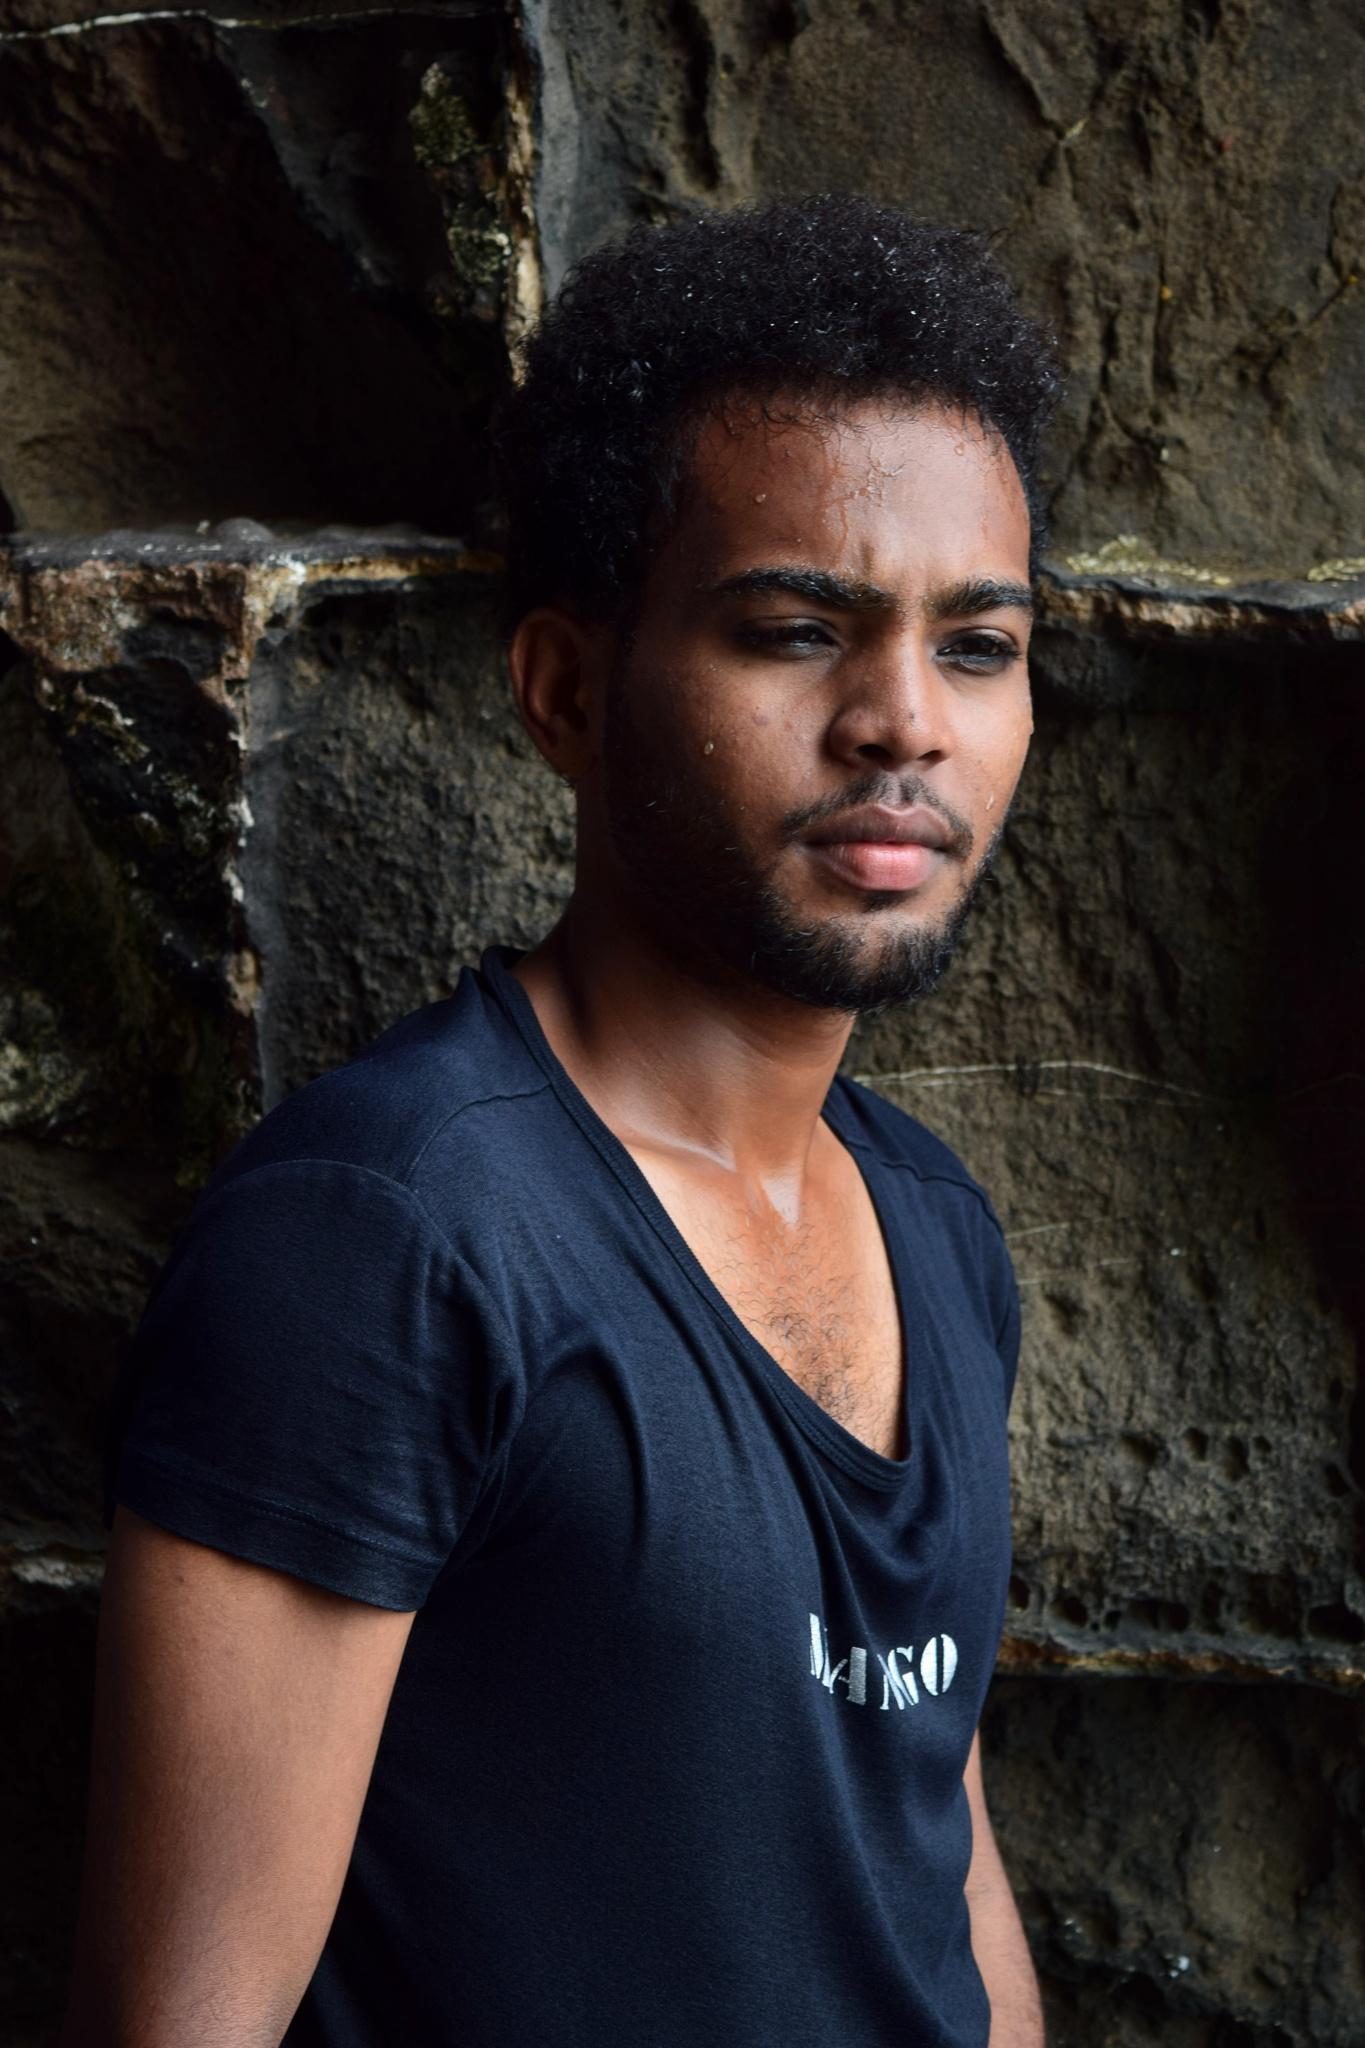 Wet to support by Prasad Dalvi